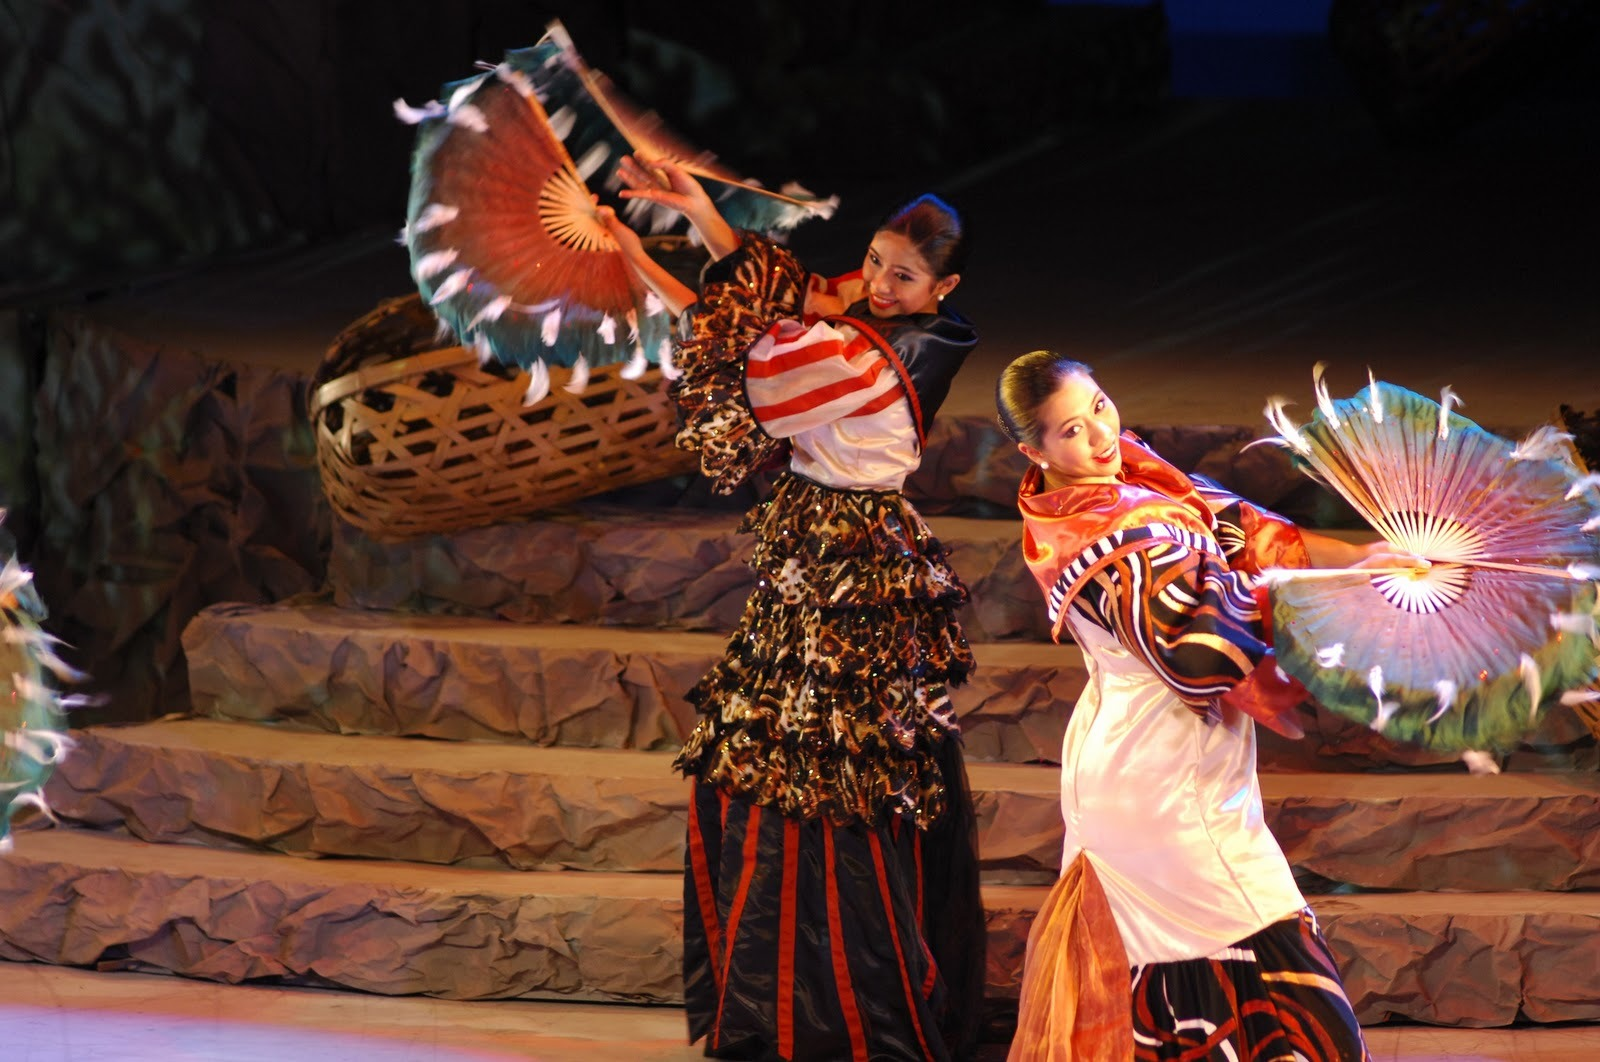 Neighborhoods of the World: Chinese New Year Lantern Celebration